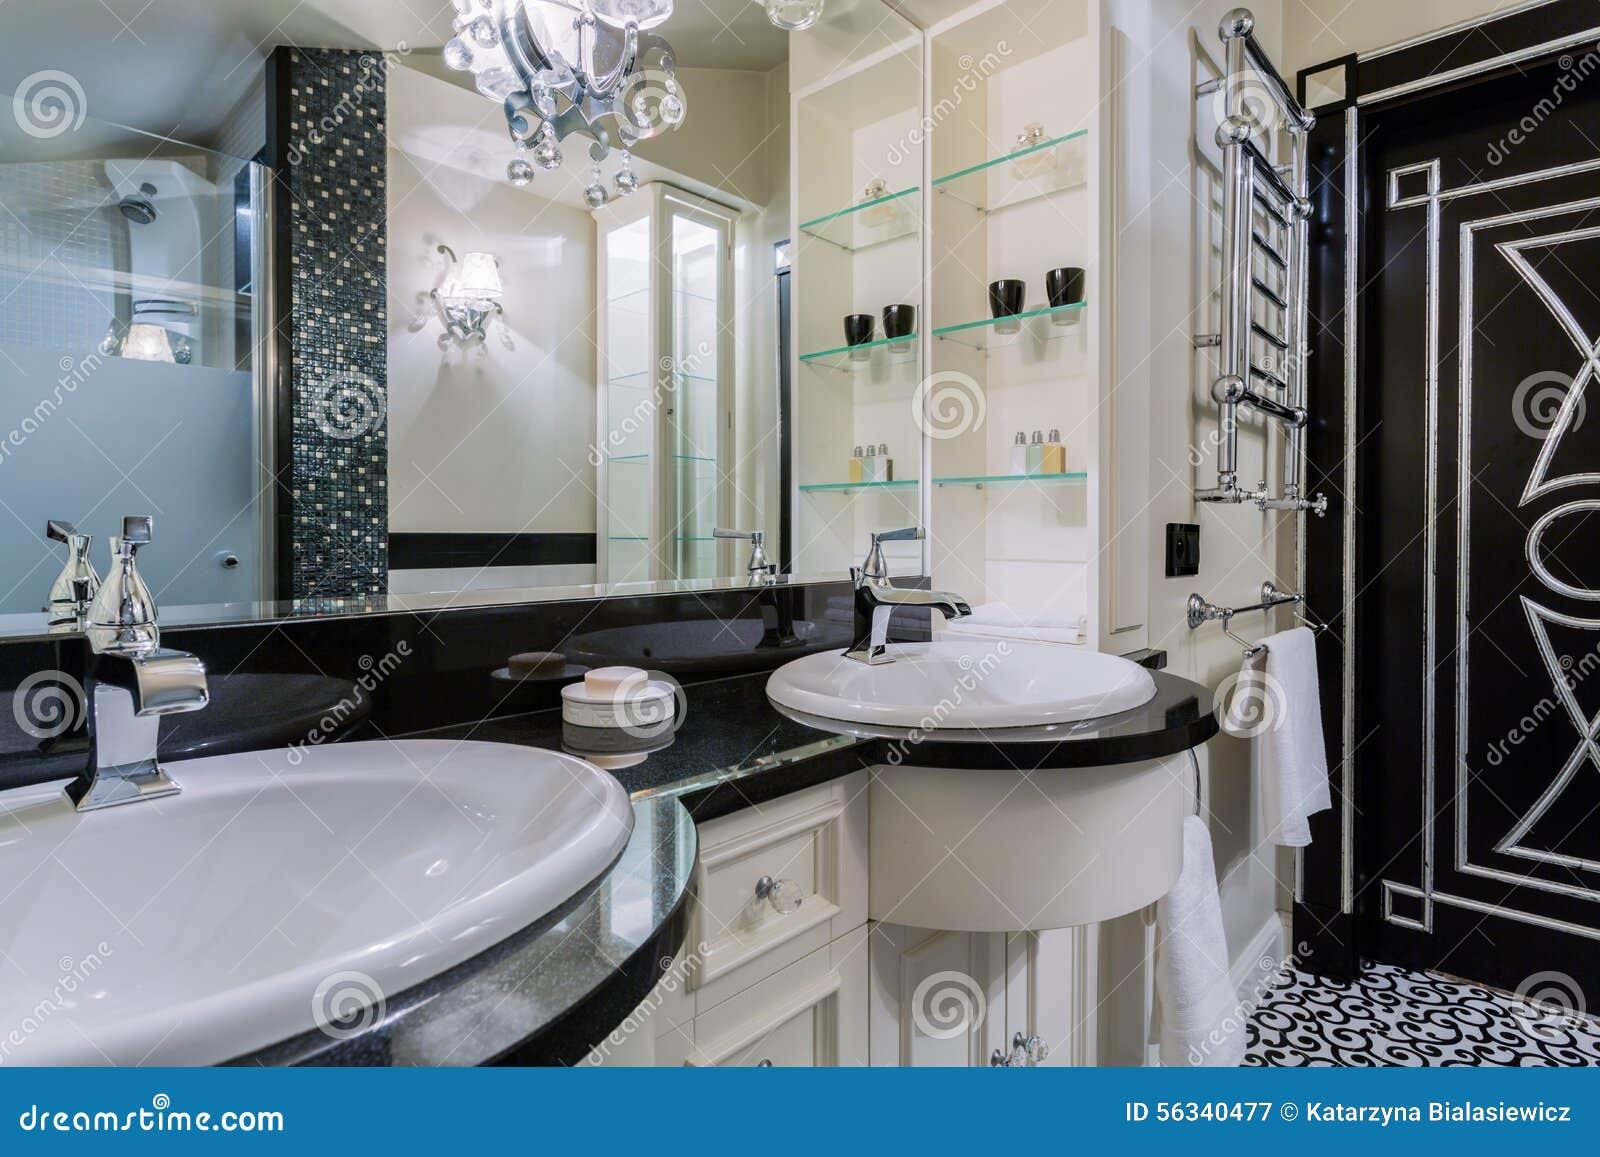 Baroque furniture in bathroom stock image cartoondealer for Baroque style bathroom